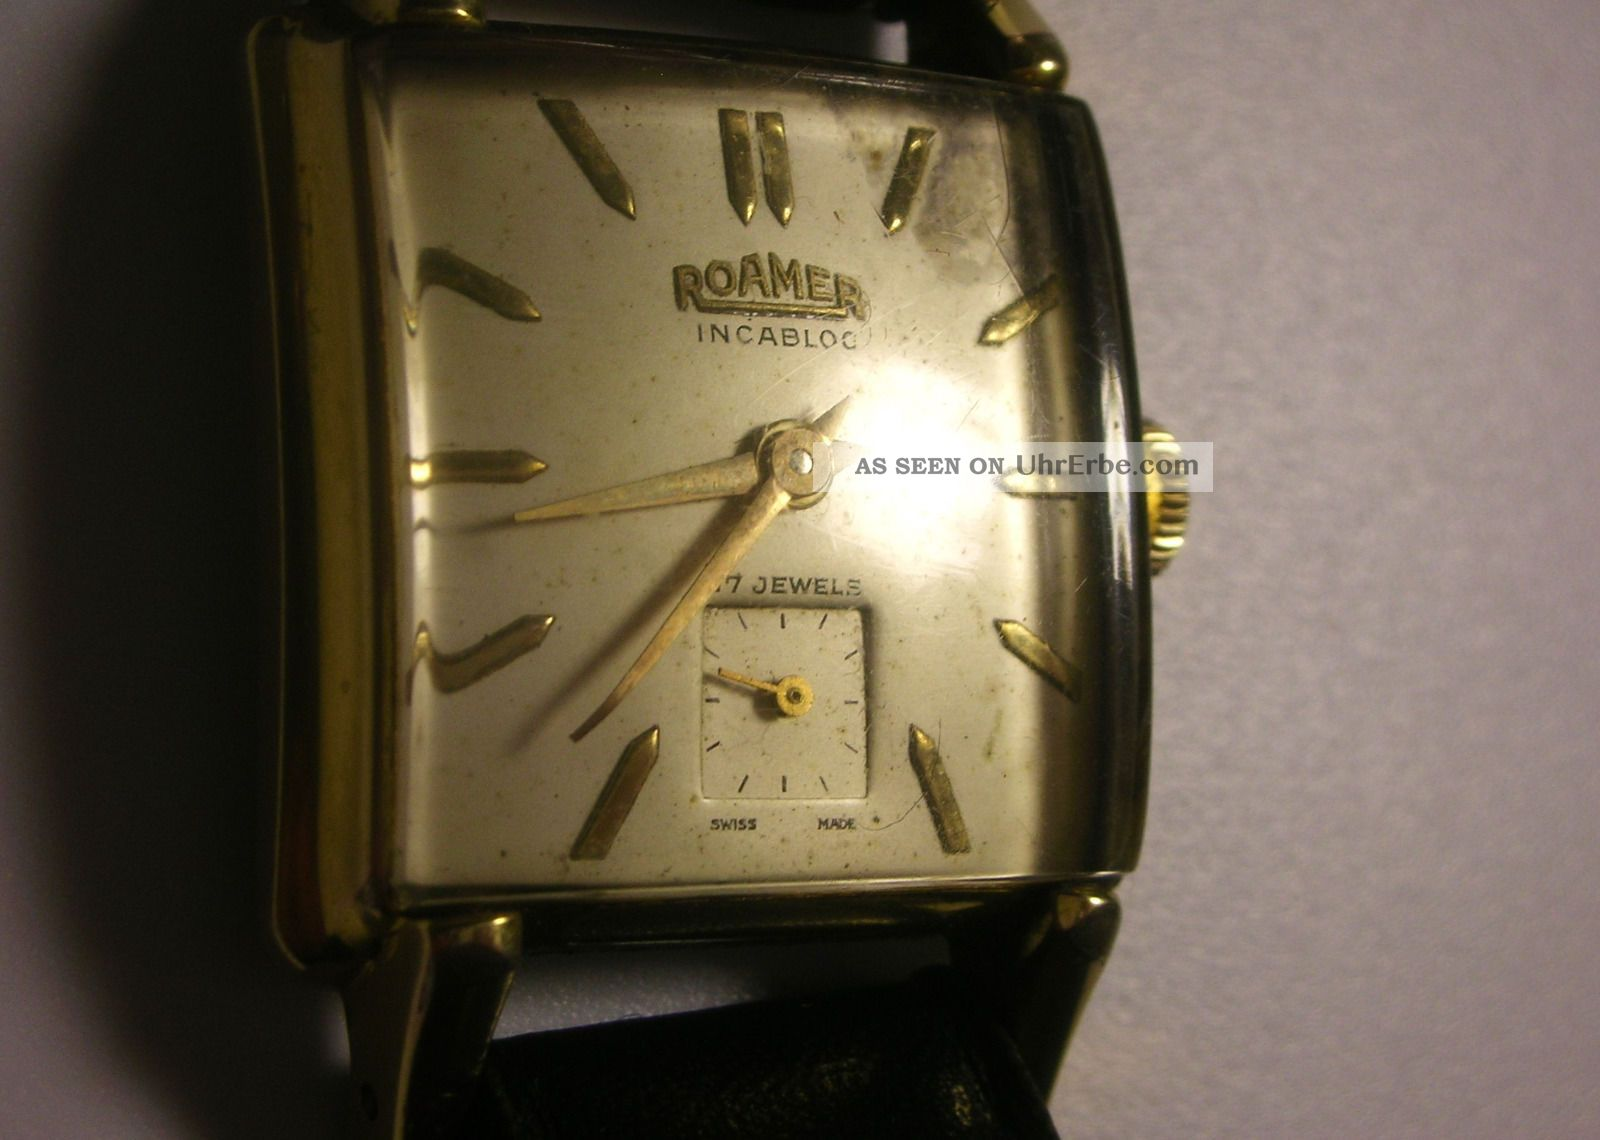 Seltene Vintage Roamer Incabloc Armbanduhr Tank & Glas Gewölbt Rarität Nachlass Armbanduhren Bild